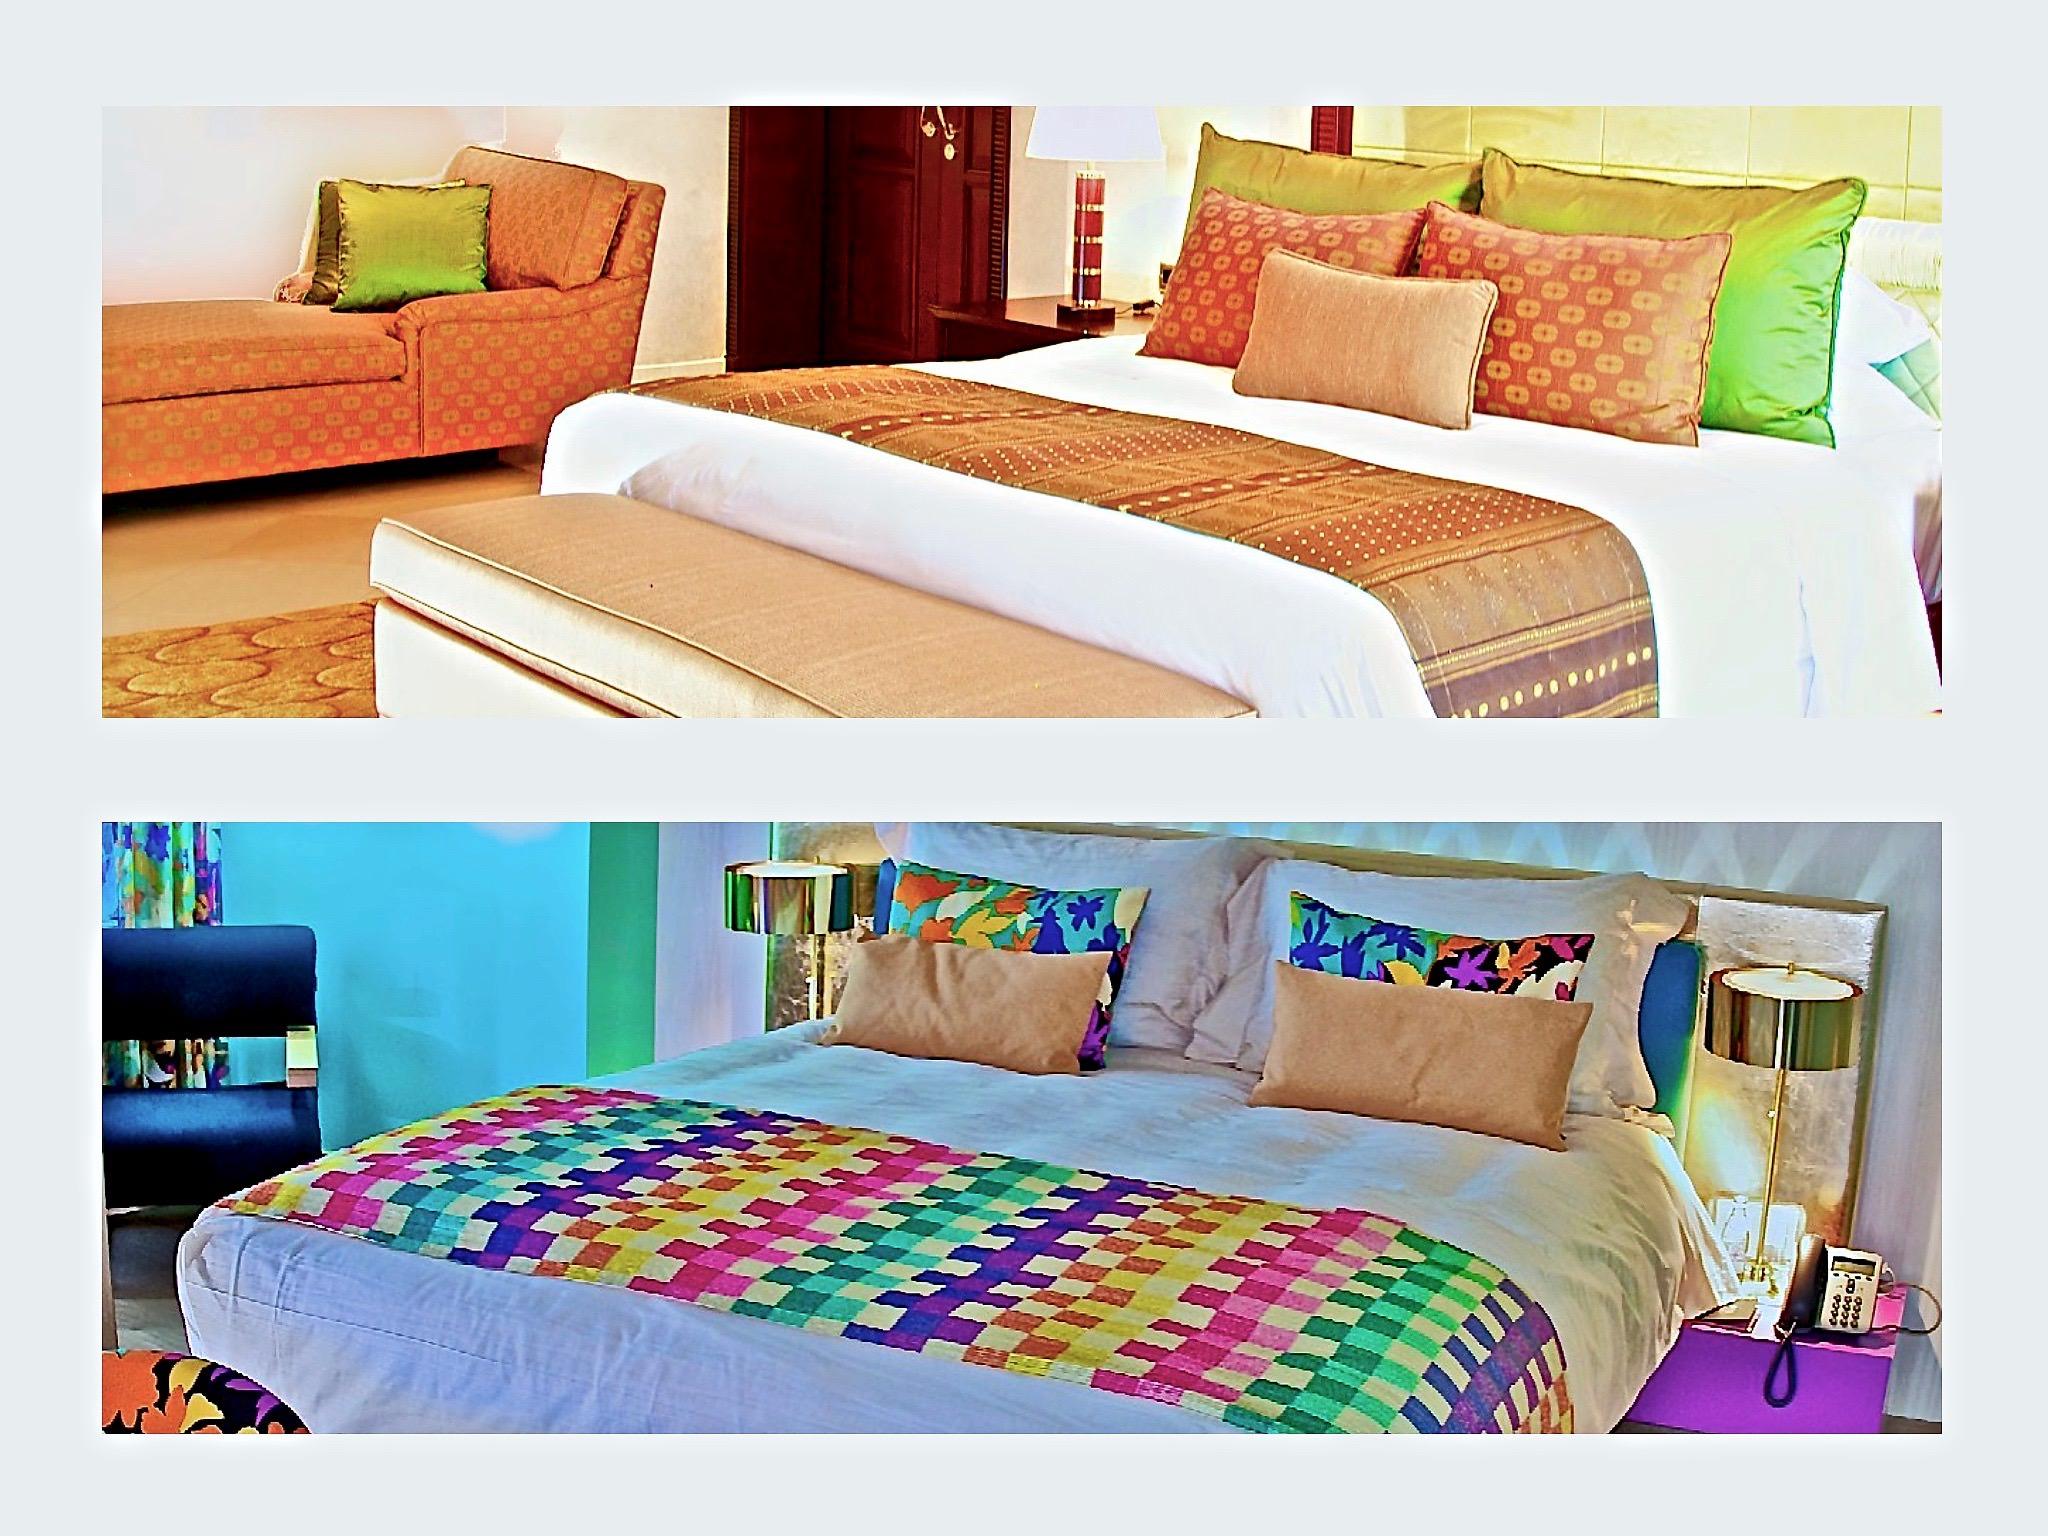 contract mattress